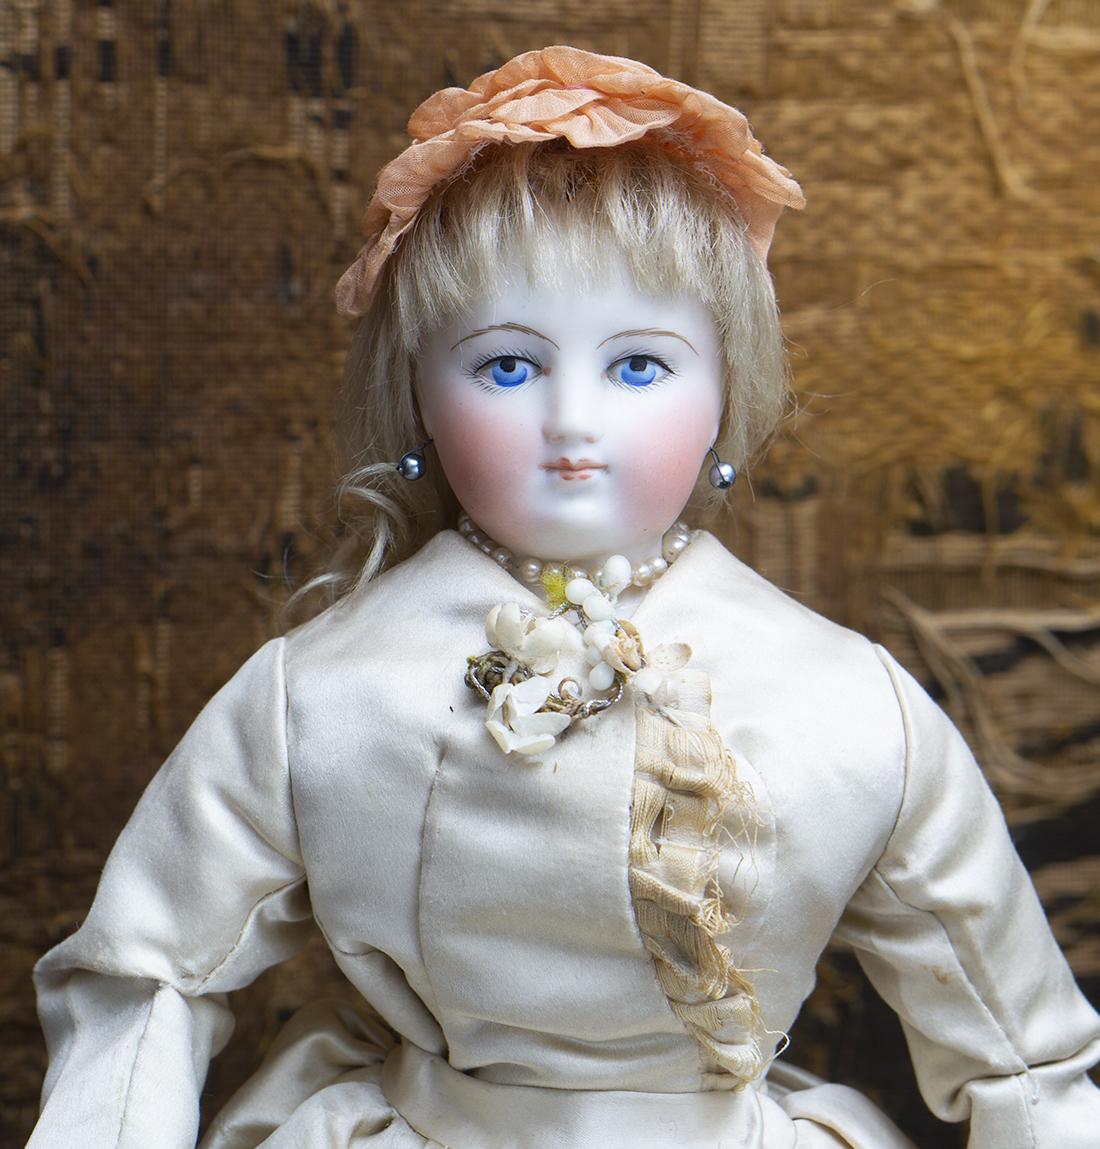 Antique FG doll